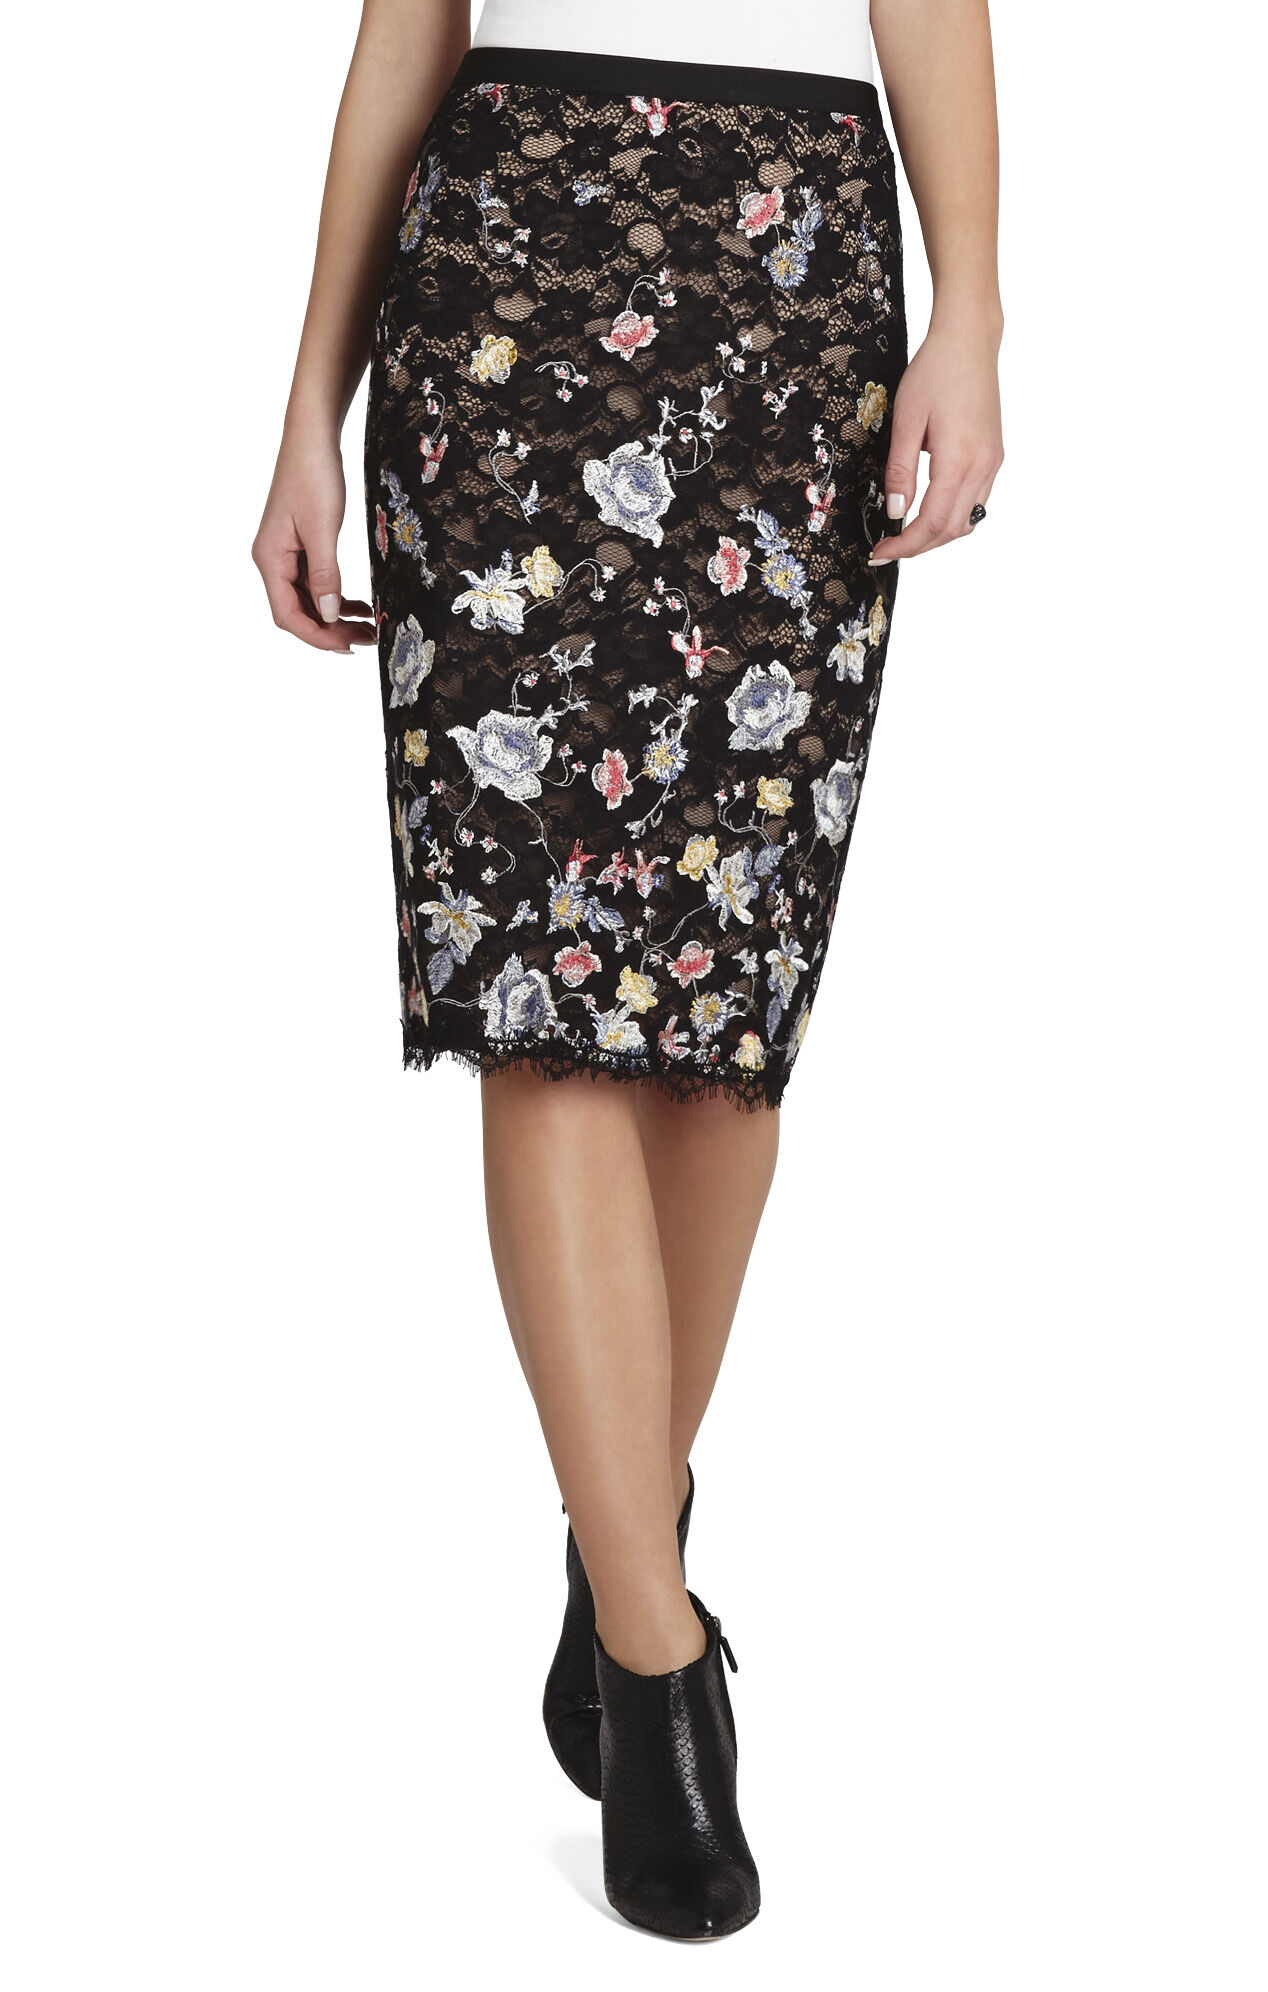 Irisa Embroidered Pencil Skirt